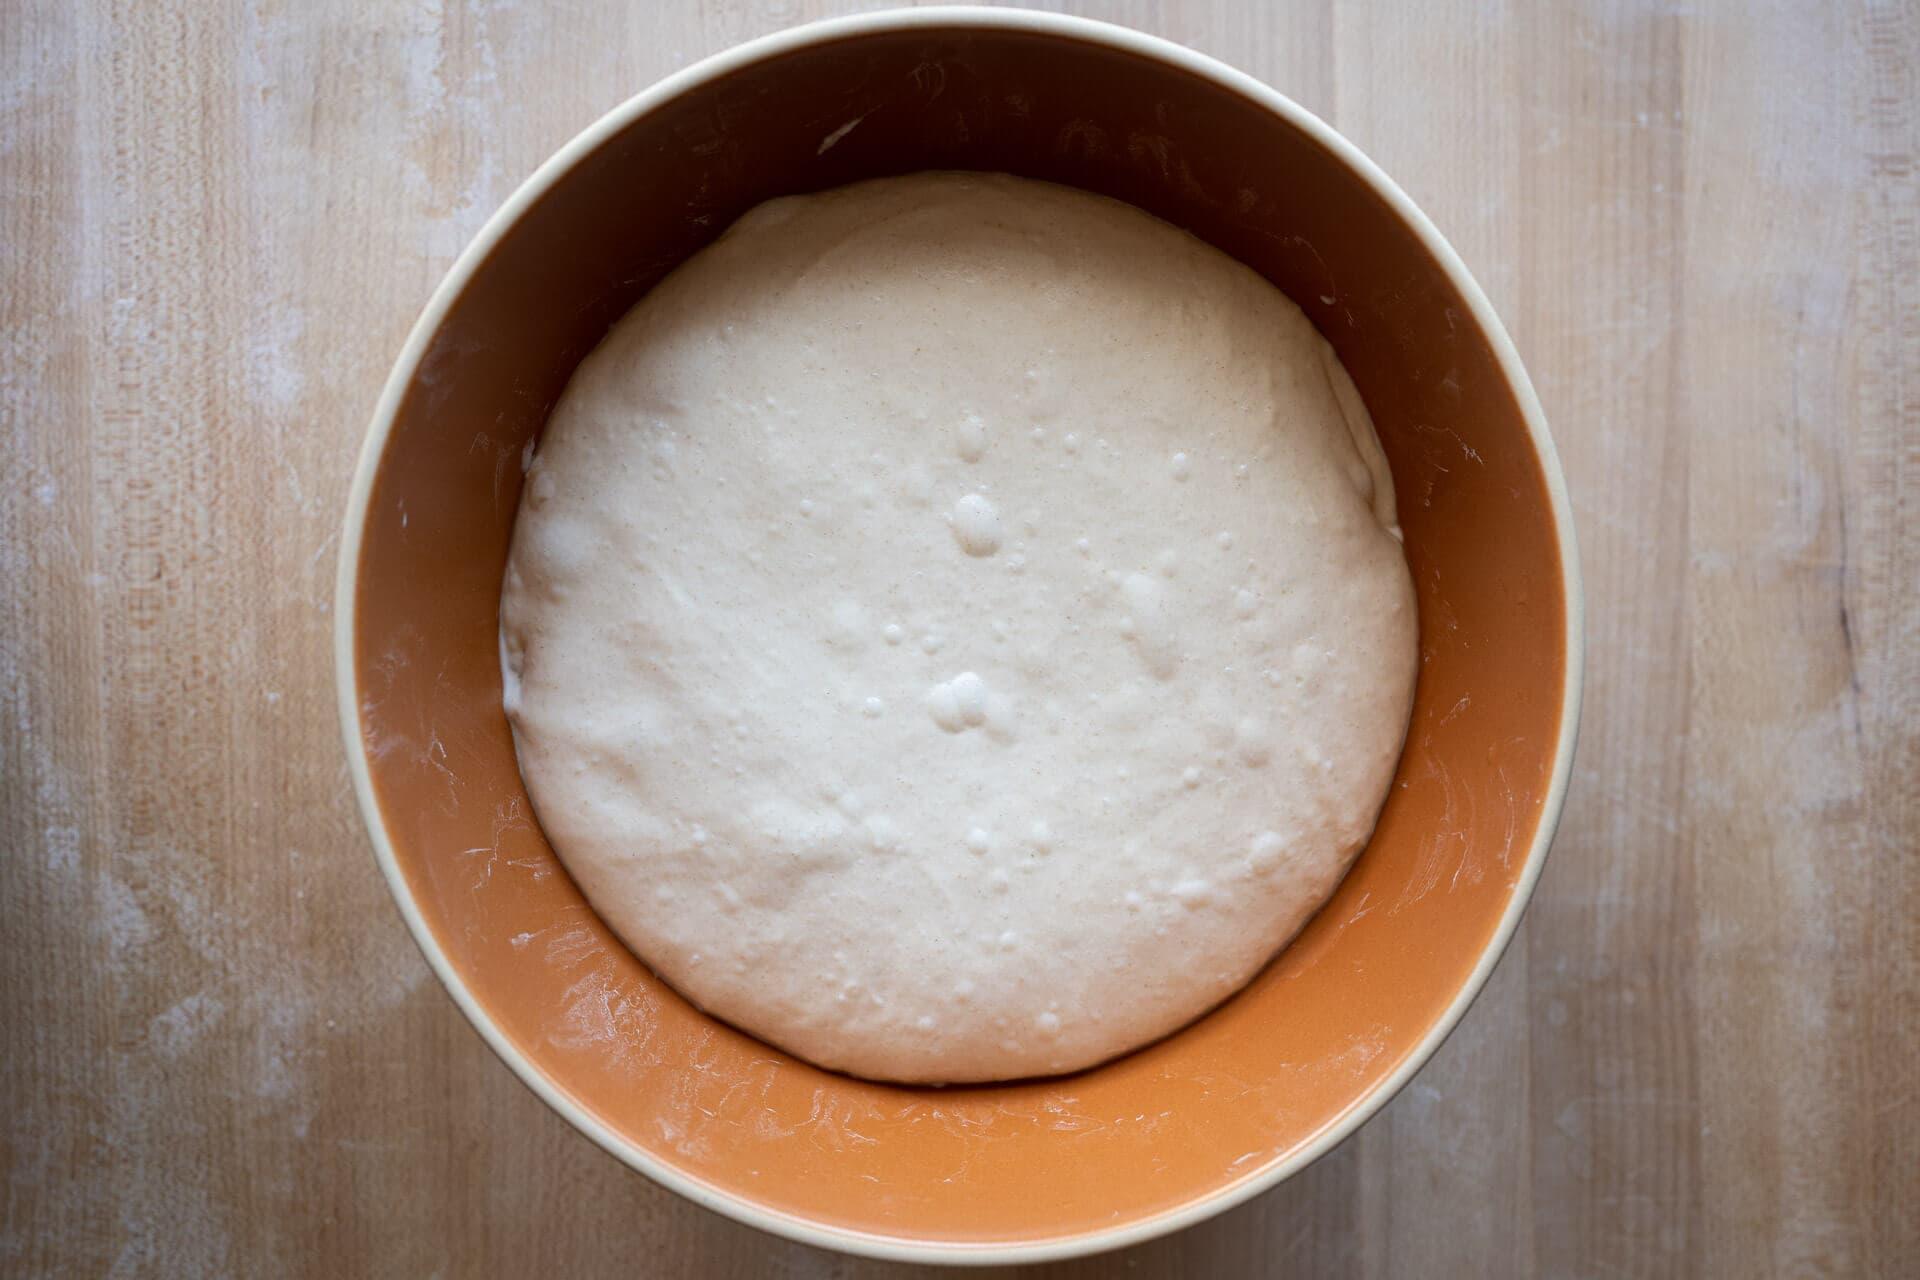 Sourdough dough at end of bulk fermentation